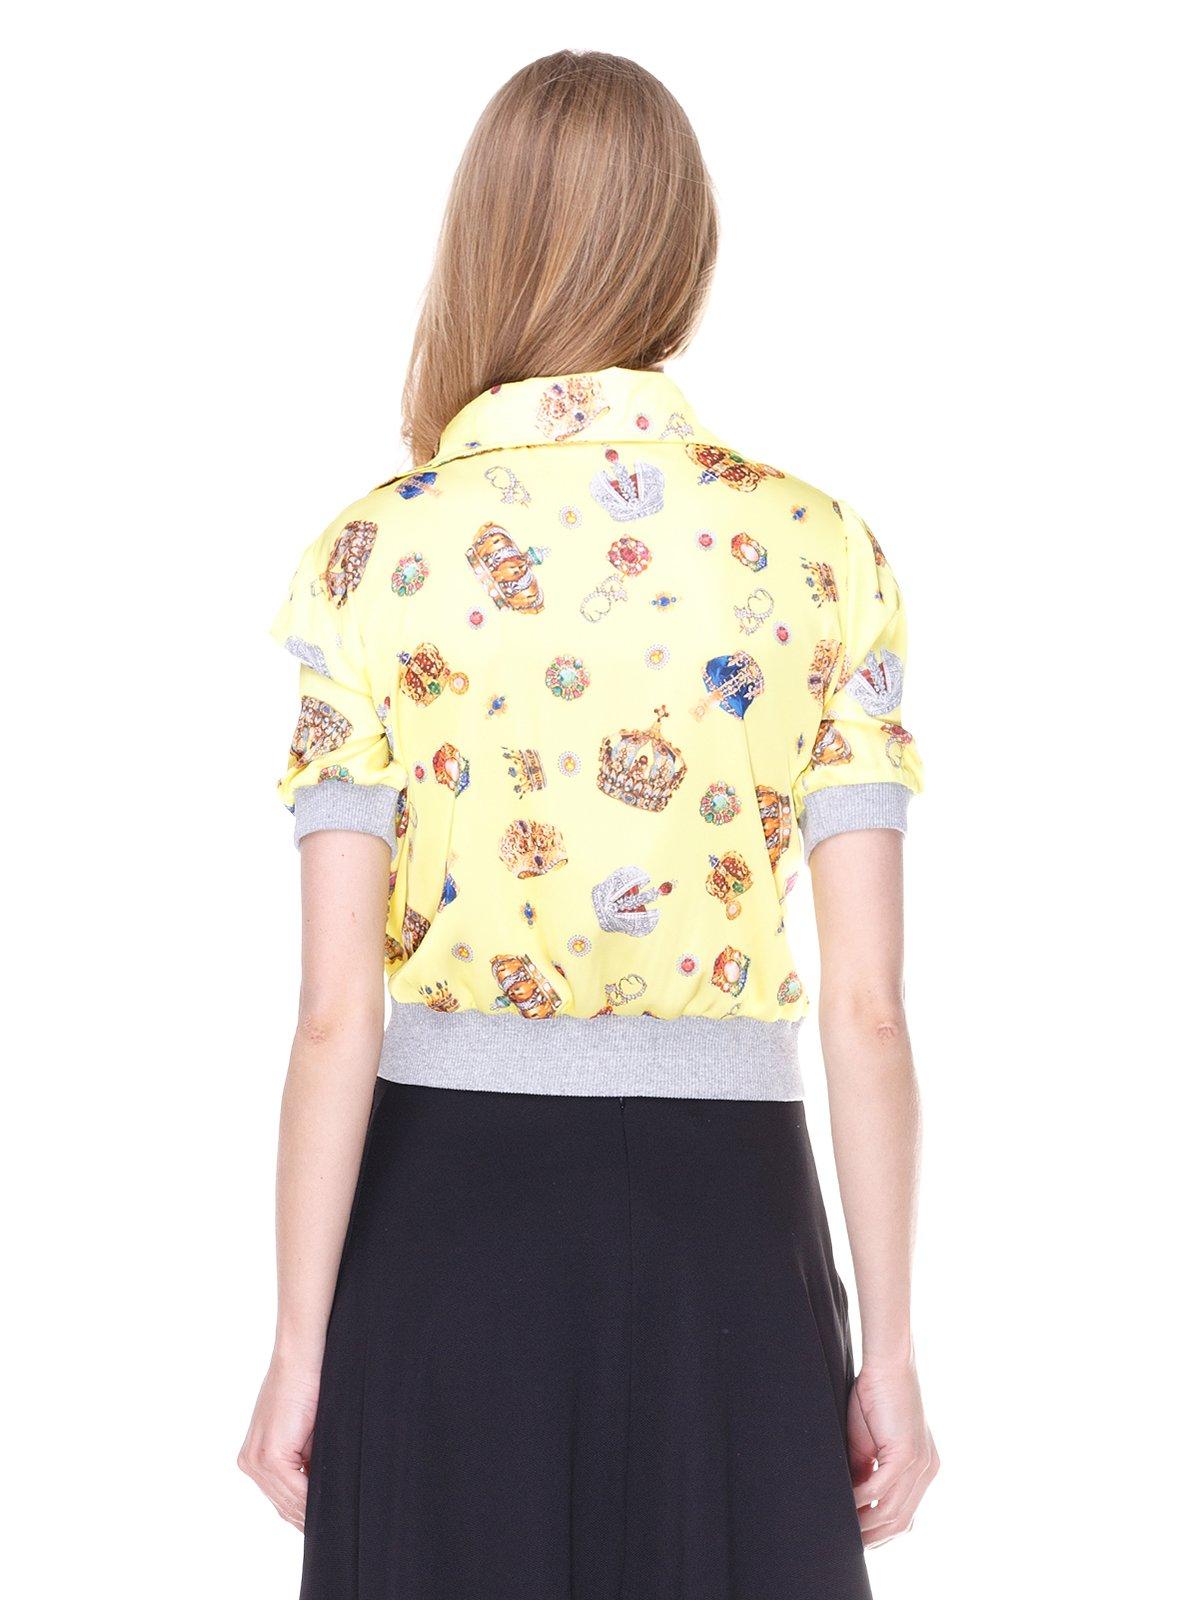 Блуза жовта з принтом | 2273964 | фото 2